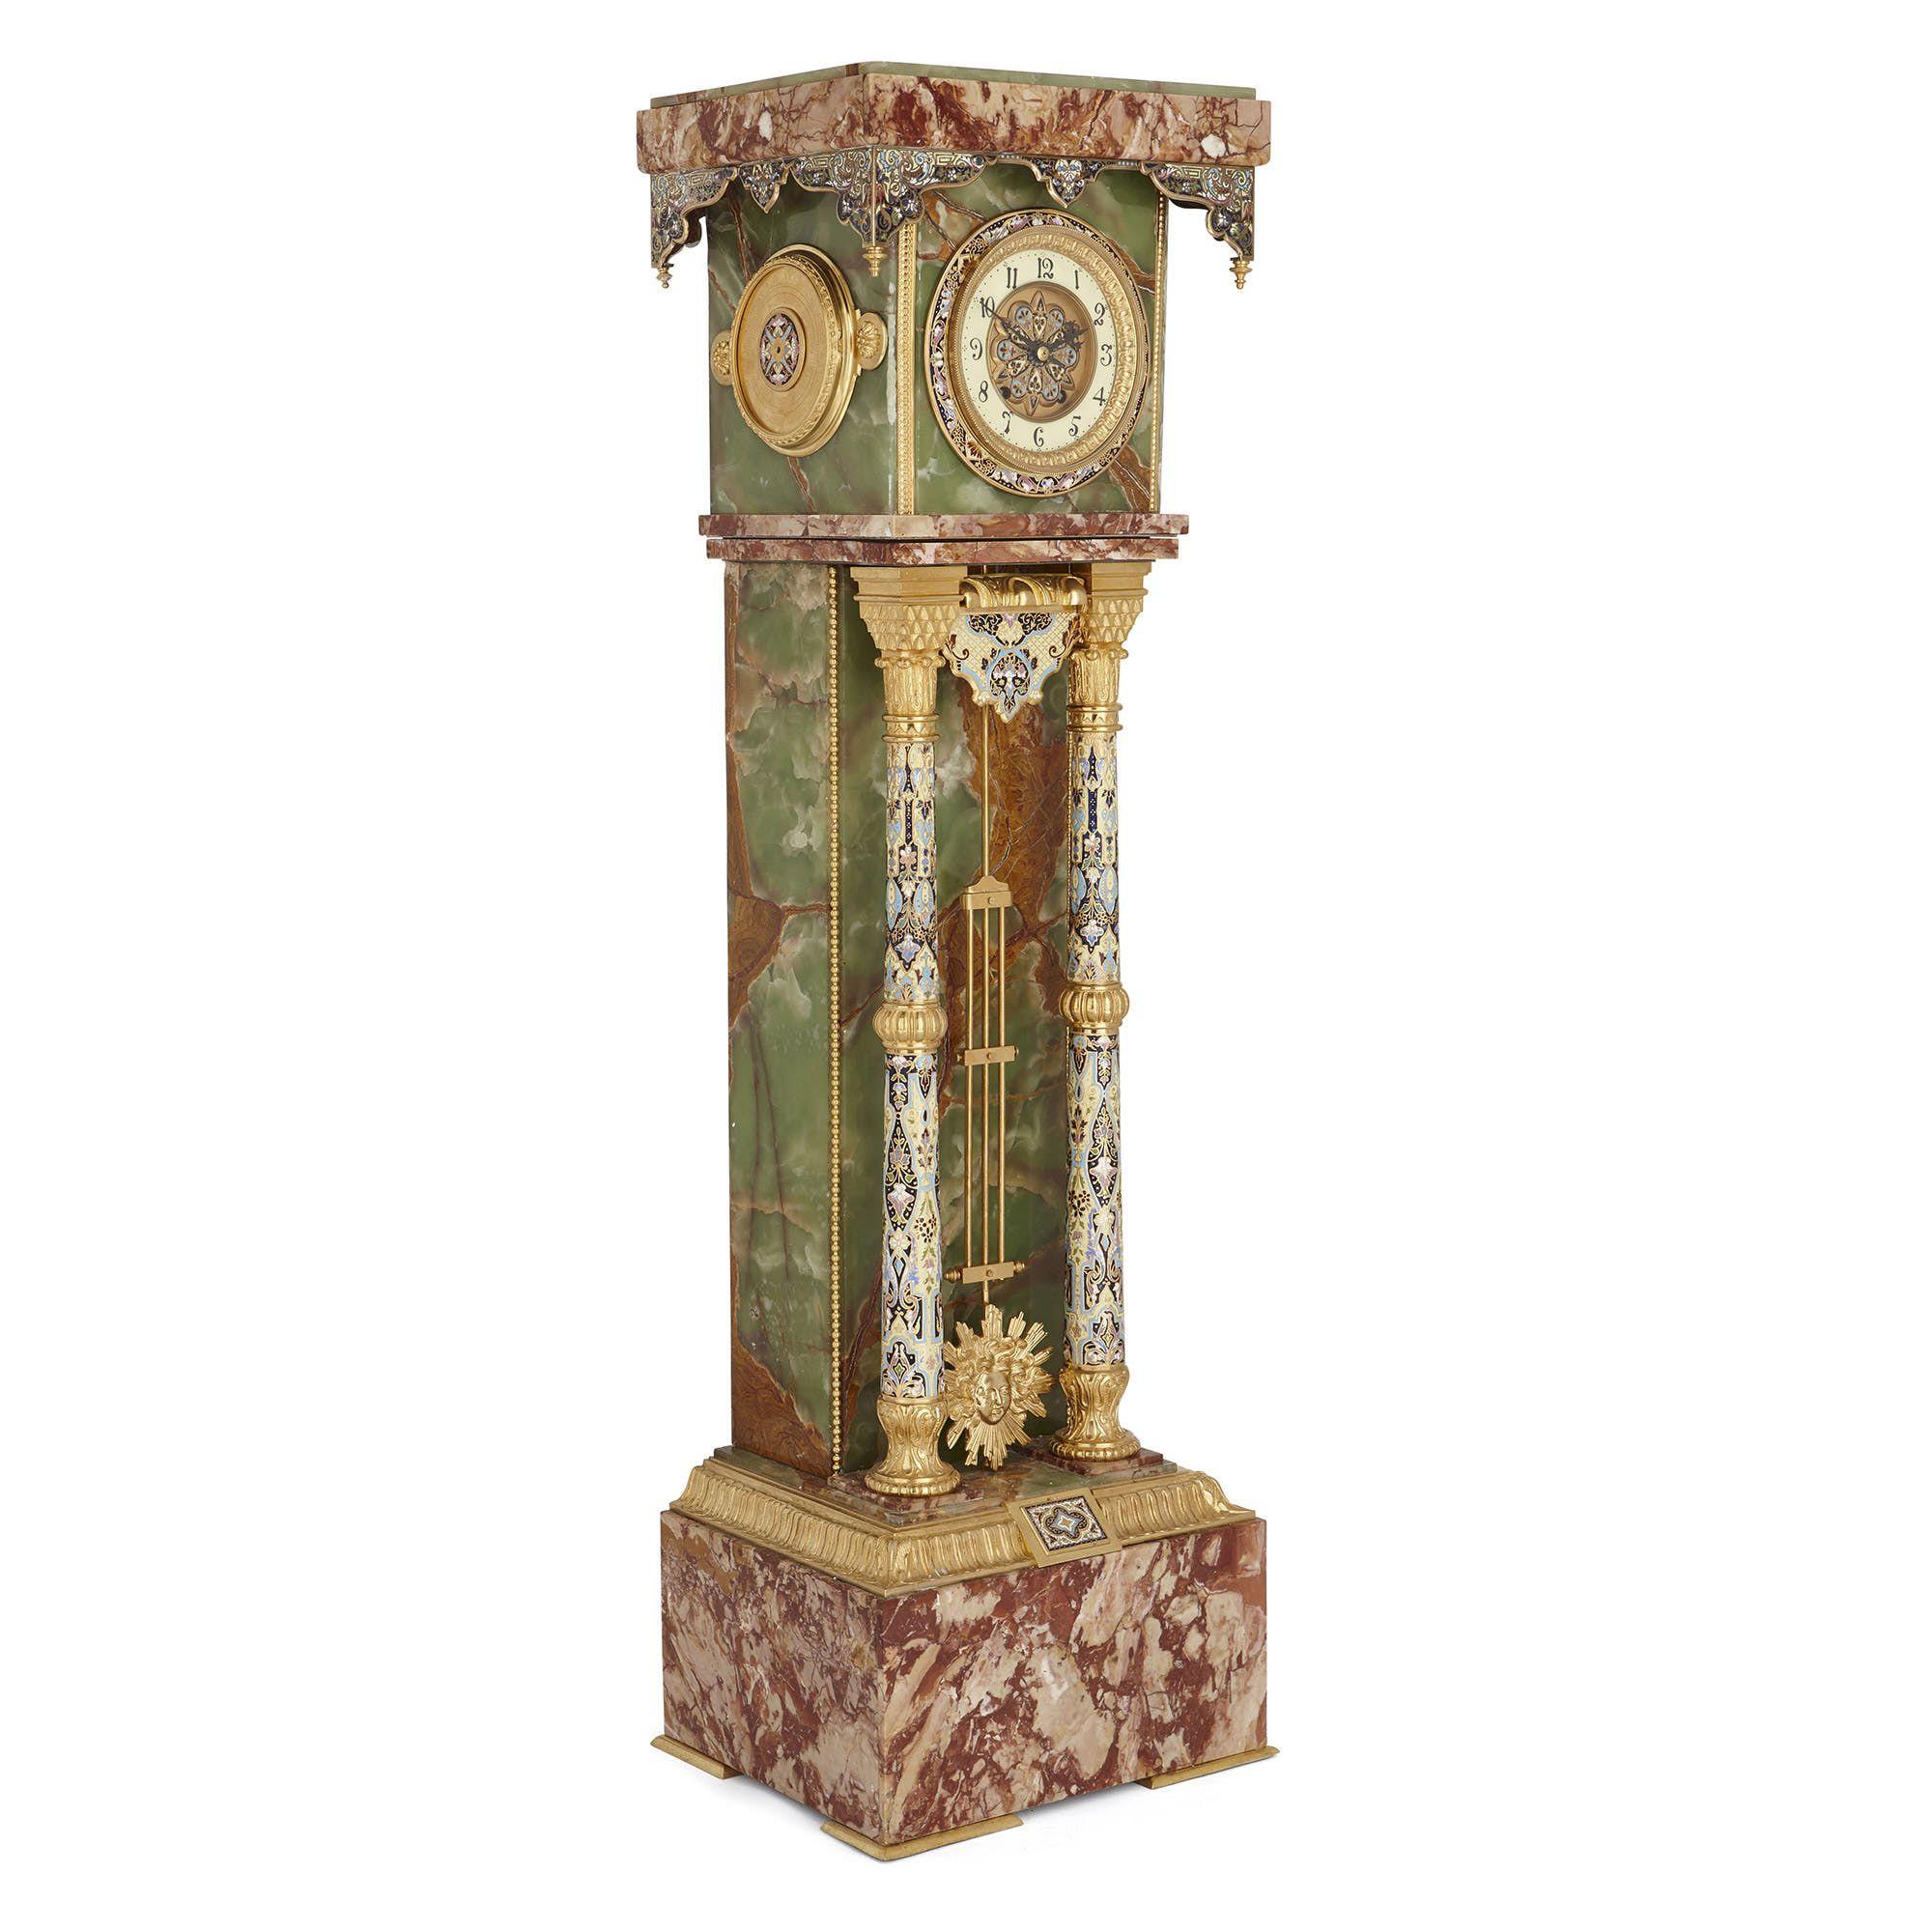 Dating longcase clock dials and bezels